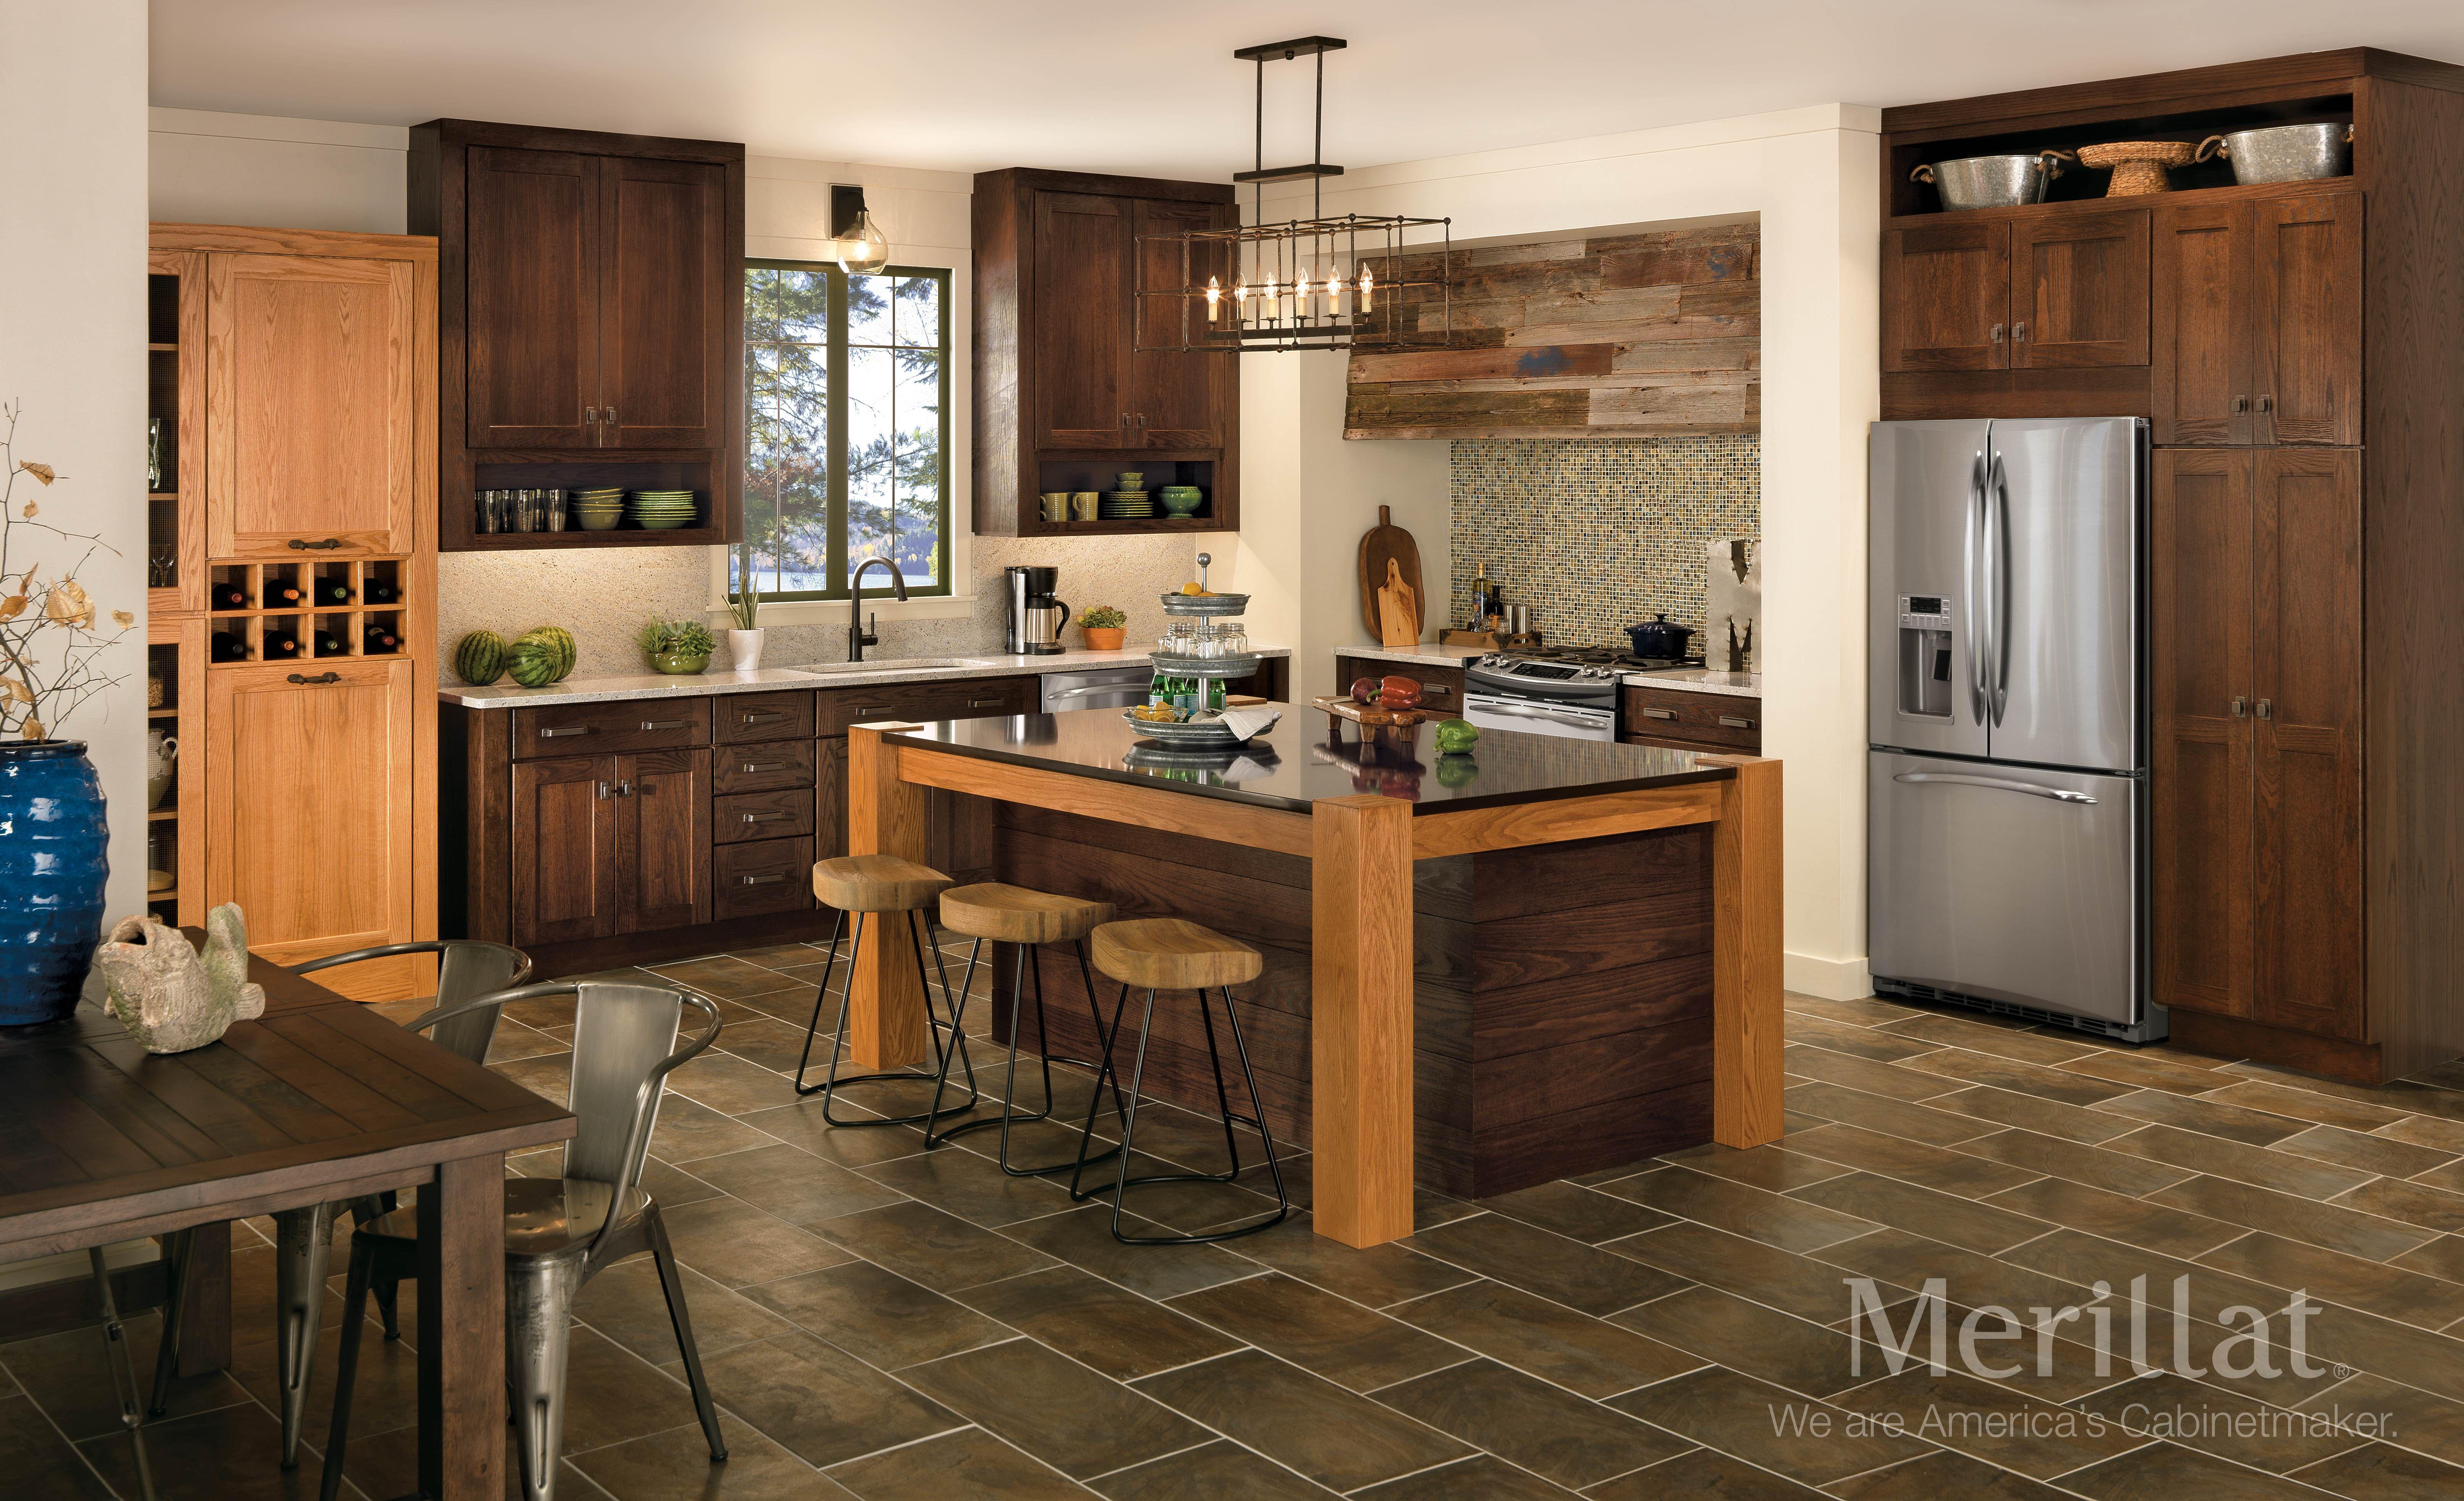 Merillat Classic Tolani Oak Pecan And Hazelnut Merillat Cabinetry Incorporate Metal Hardw Kitchen Cabinet Design Kitchen Design Merillat Kitchen Cabinets